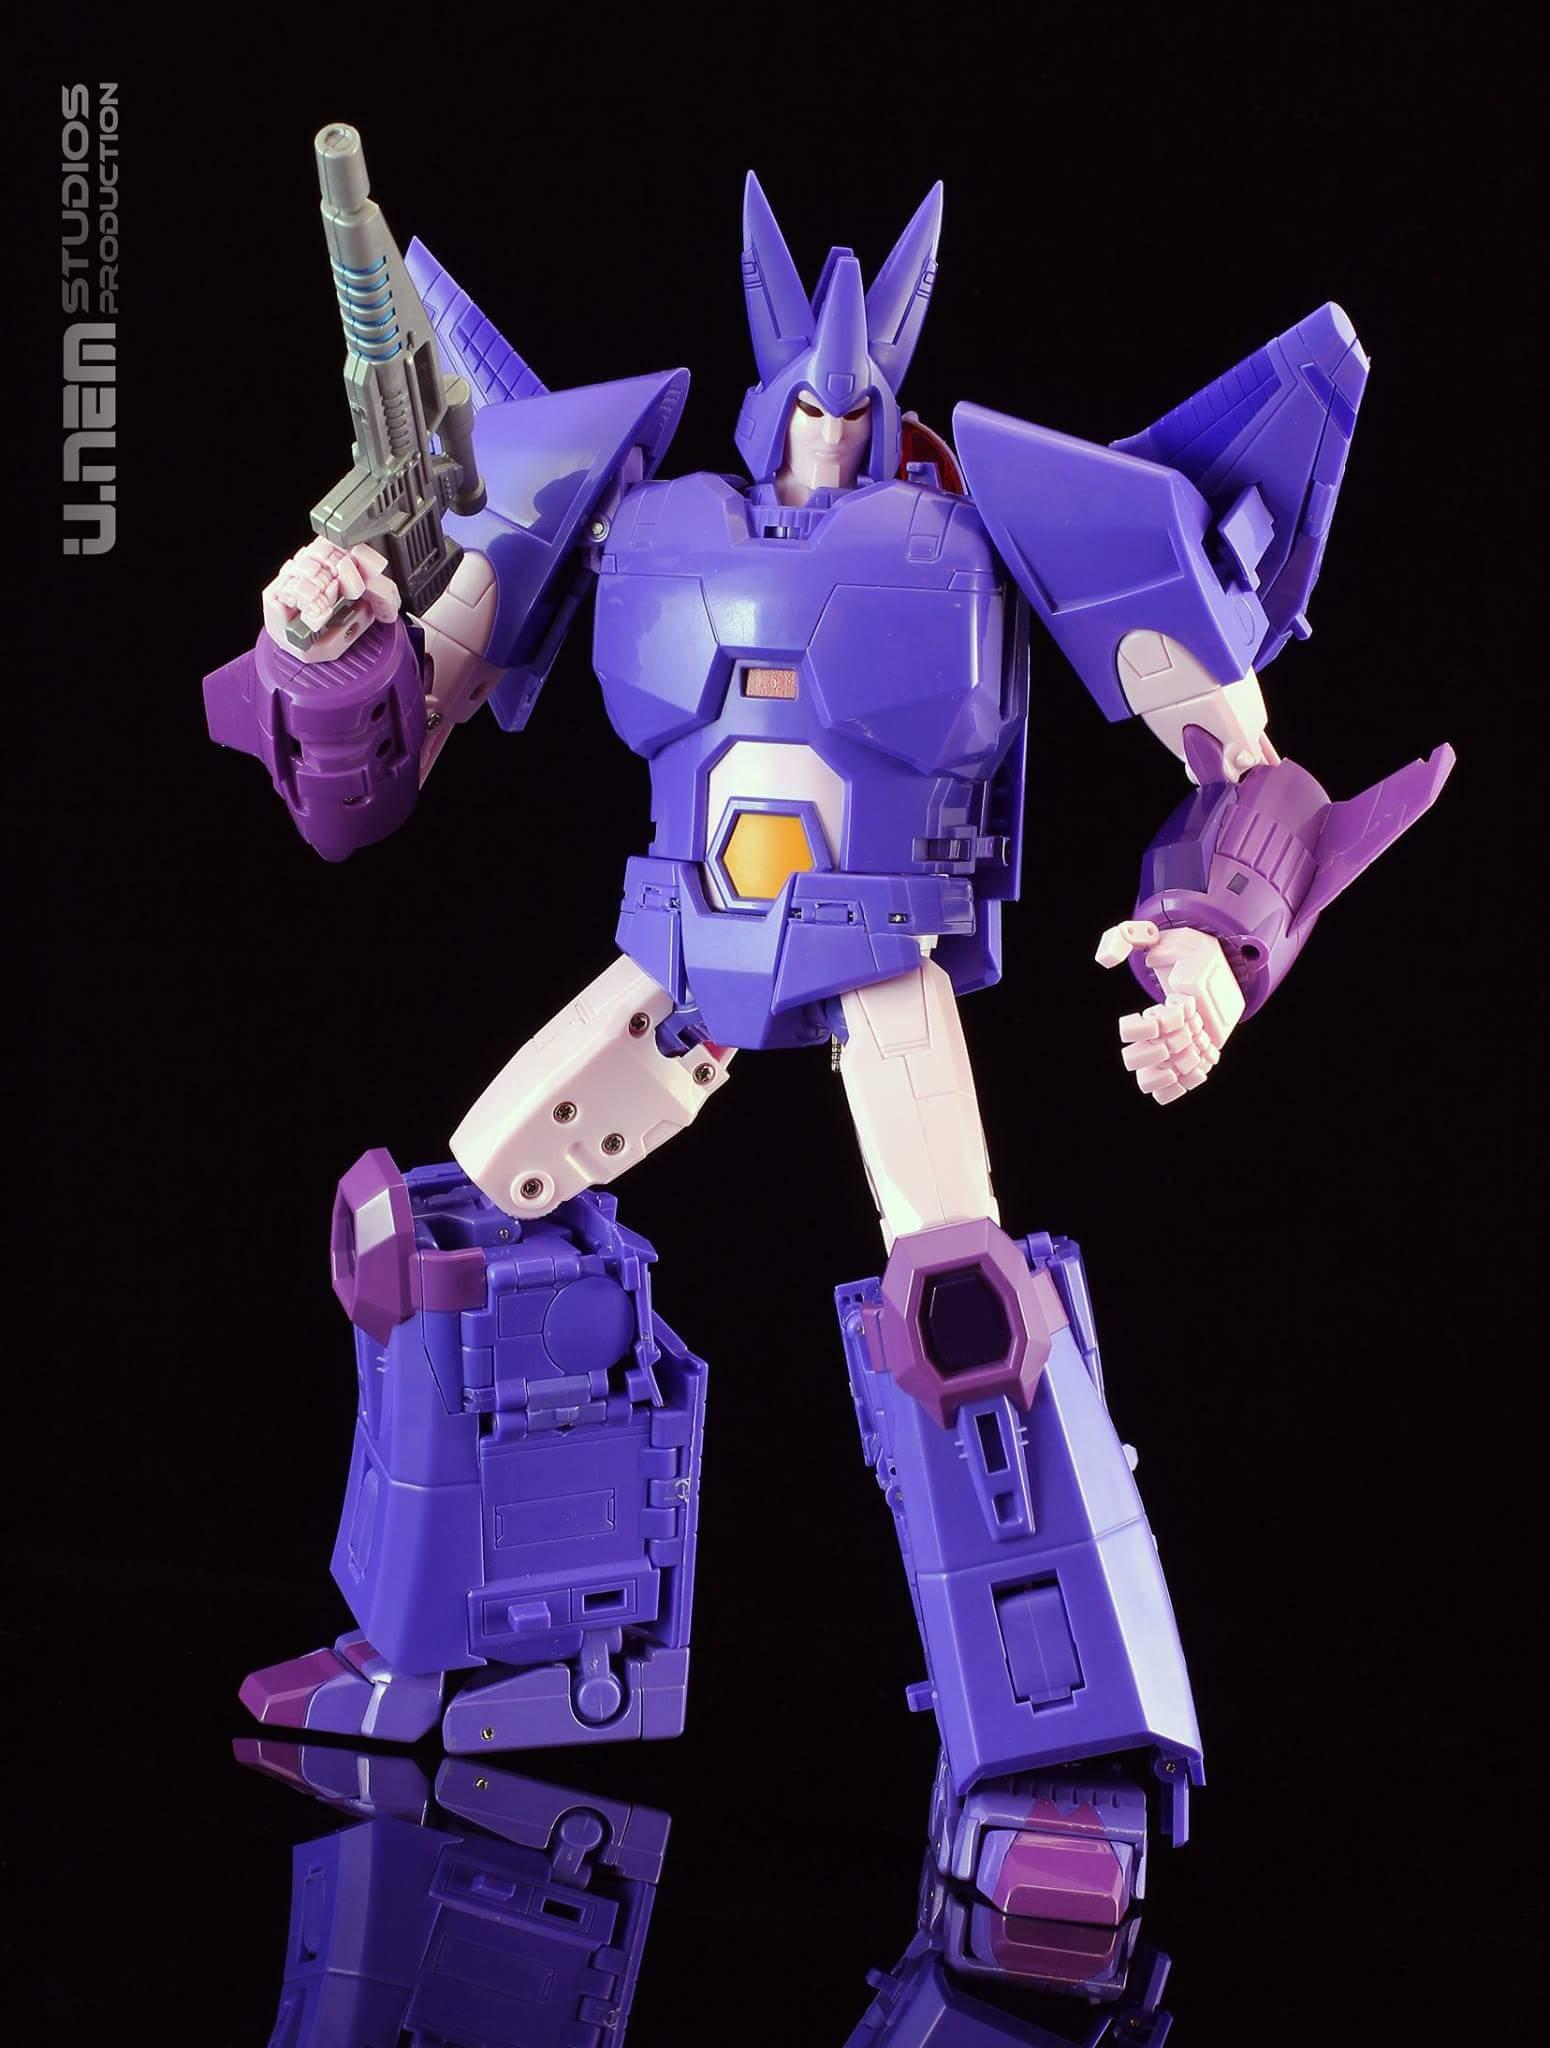 [X-Transbots] Produit Tiers - MX-III Eligos - aka Cyclonus - Page 3 HWH5aypO